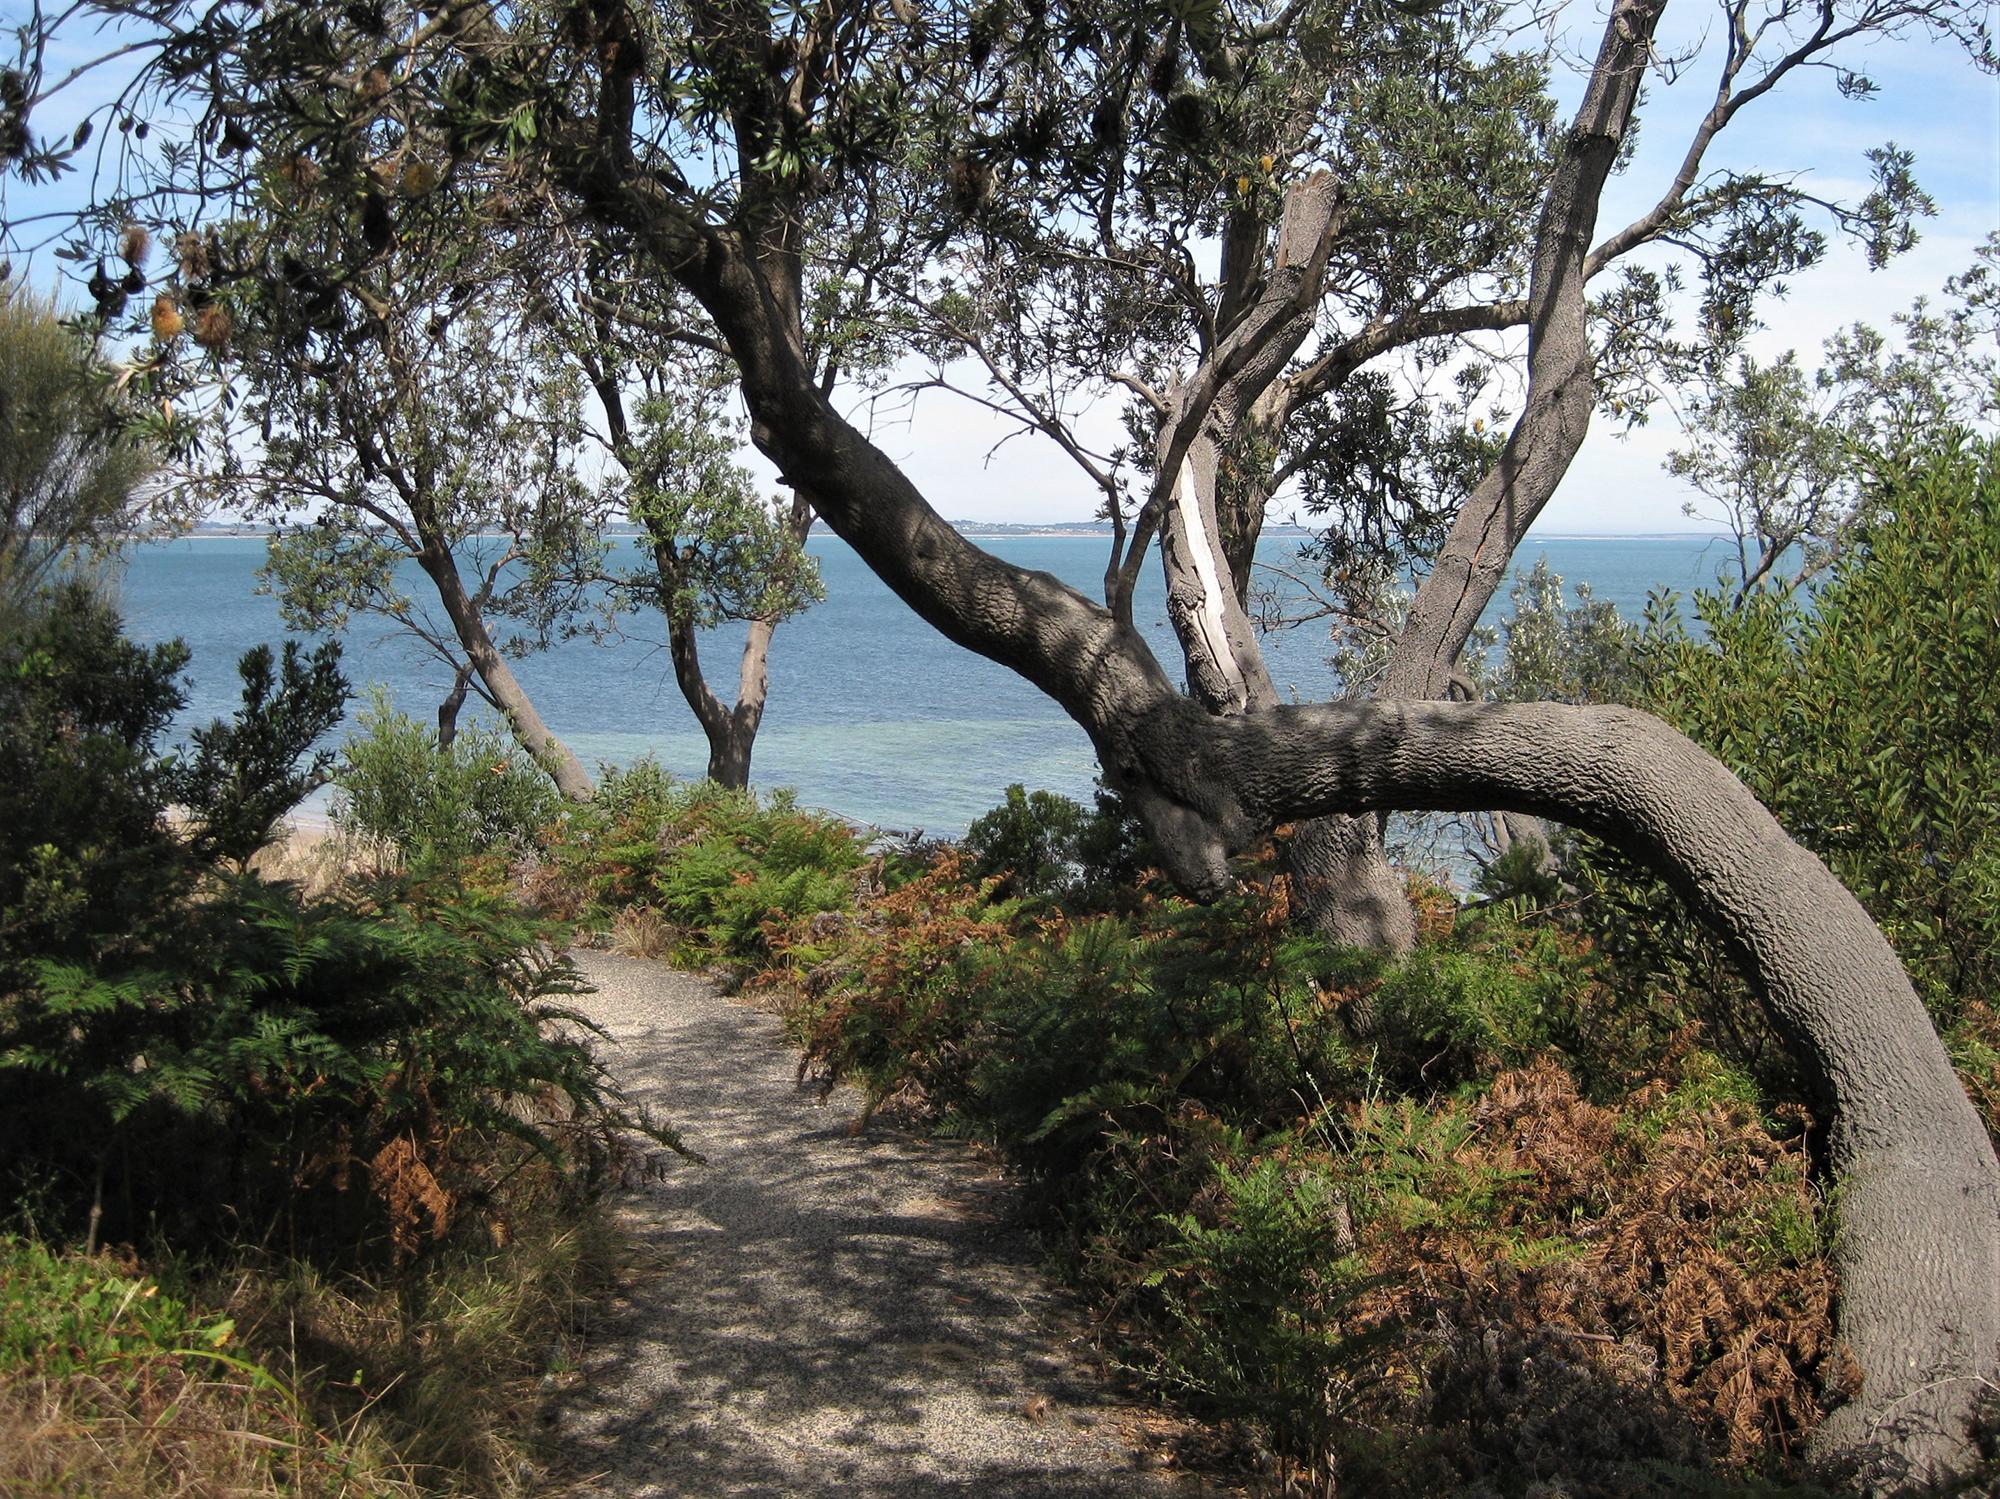 Somers Beach, Victoria, Australia - Writers Residency